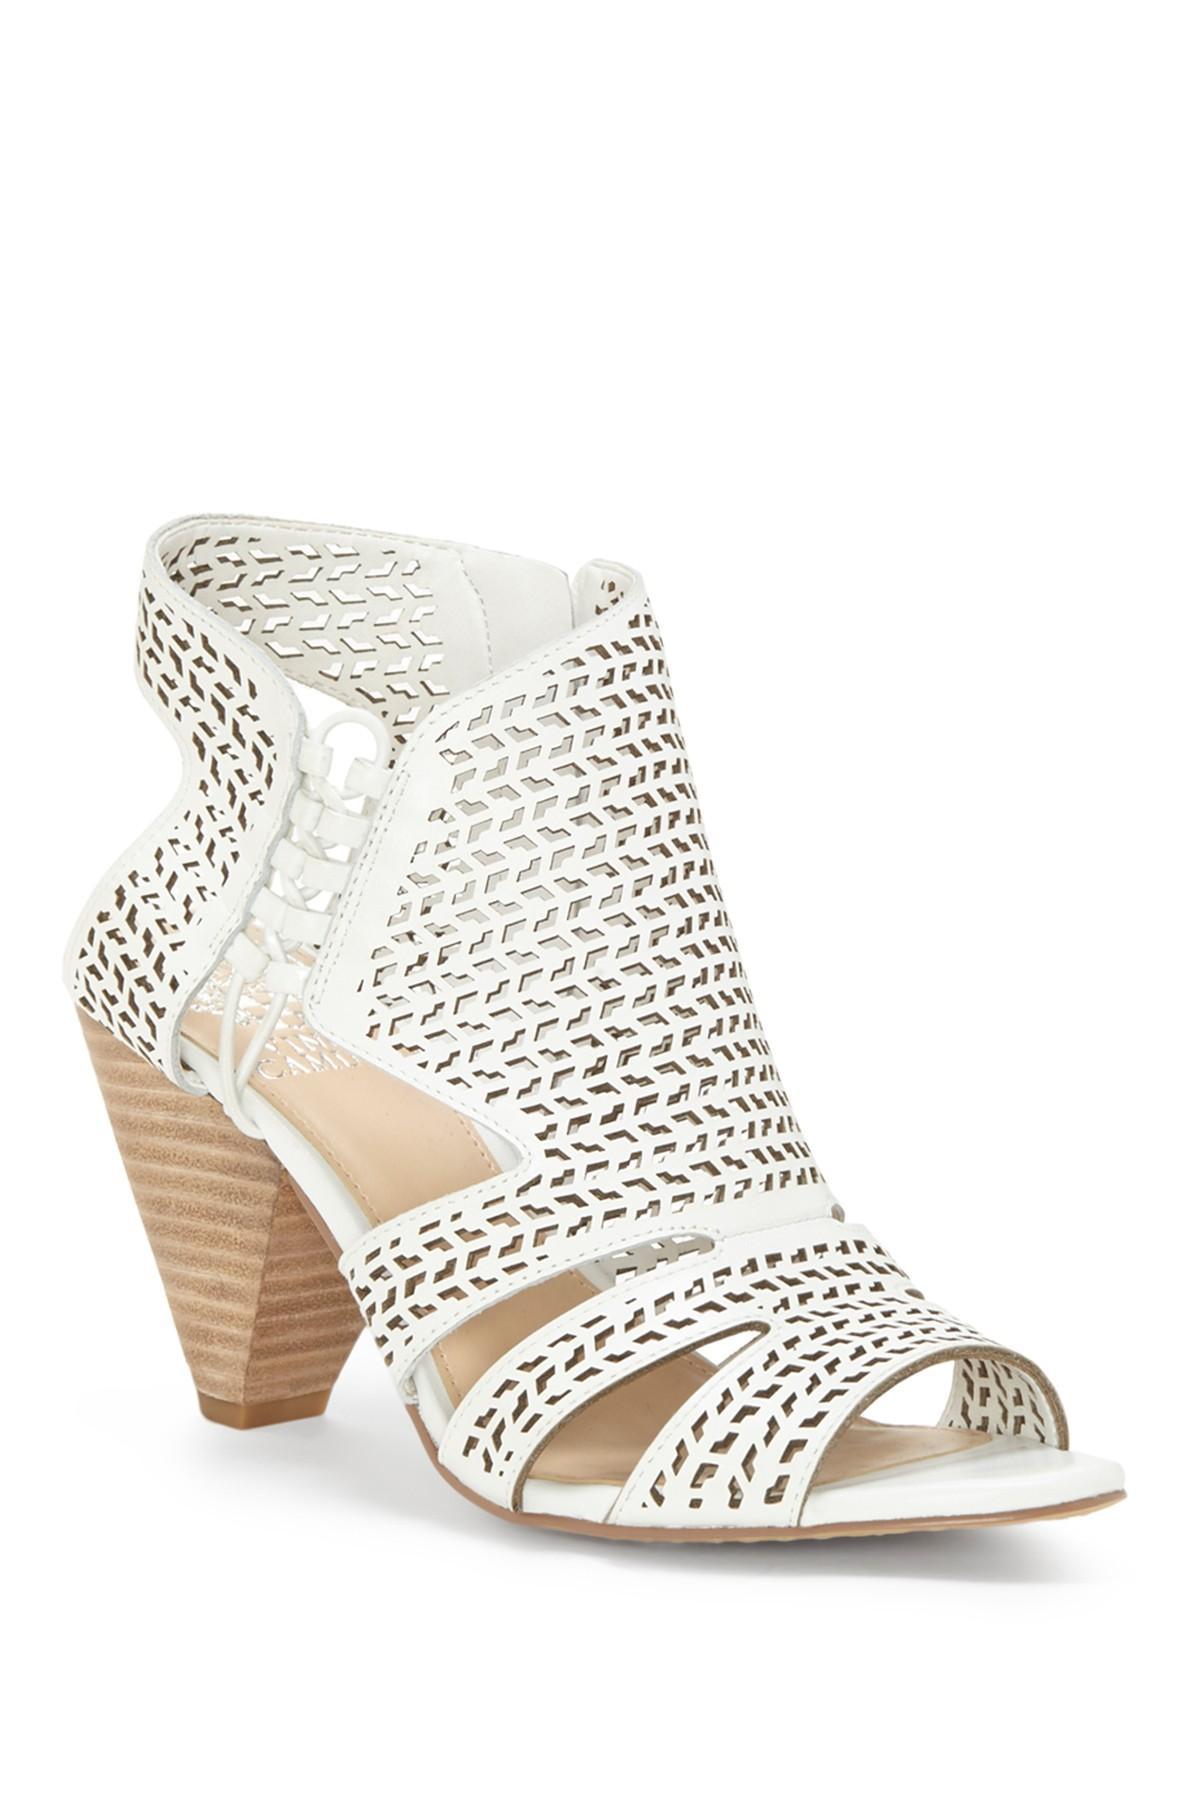 e52b3a7a048 Vince Camuto. Women s Esten Perforated Sandal